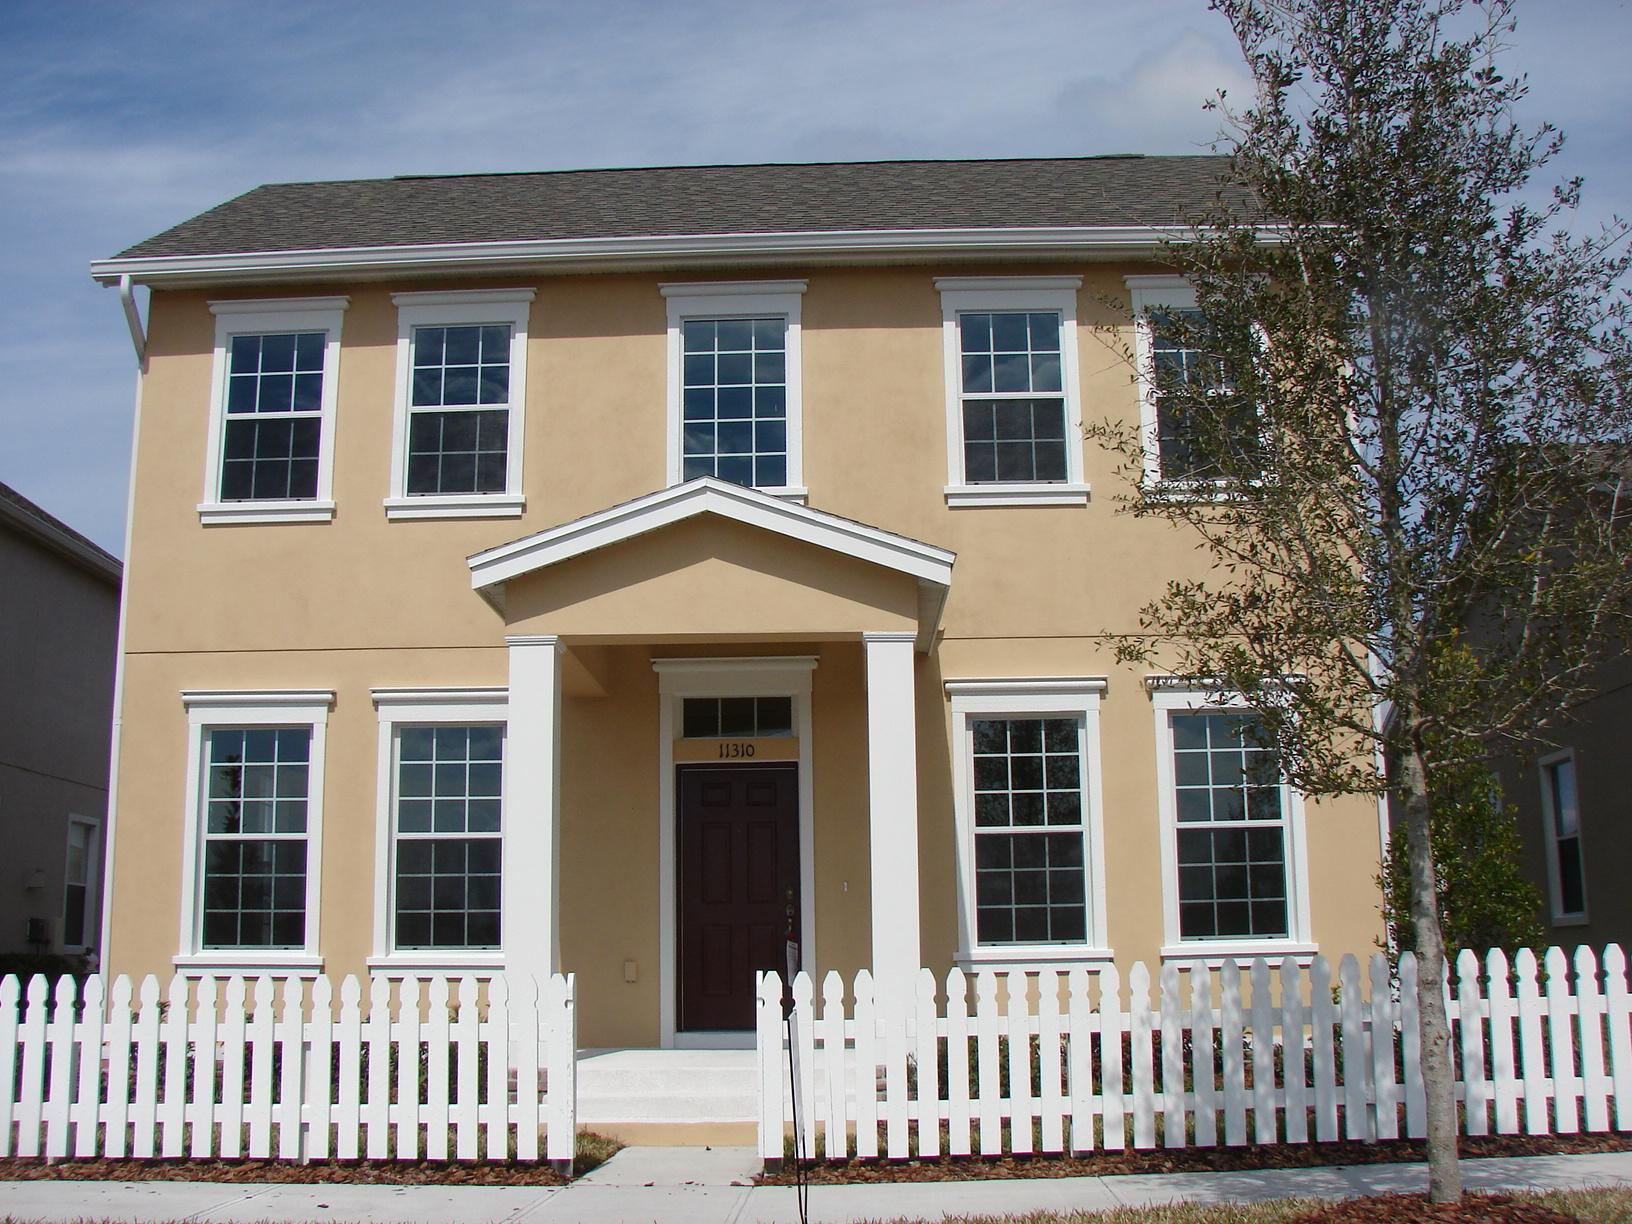 Winthrop Village Riverview Florida Real Estate   Riverview Realtor   New Homes for Sale   Riverview Florida